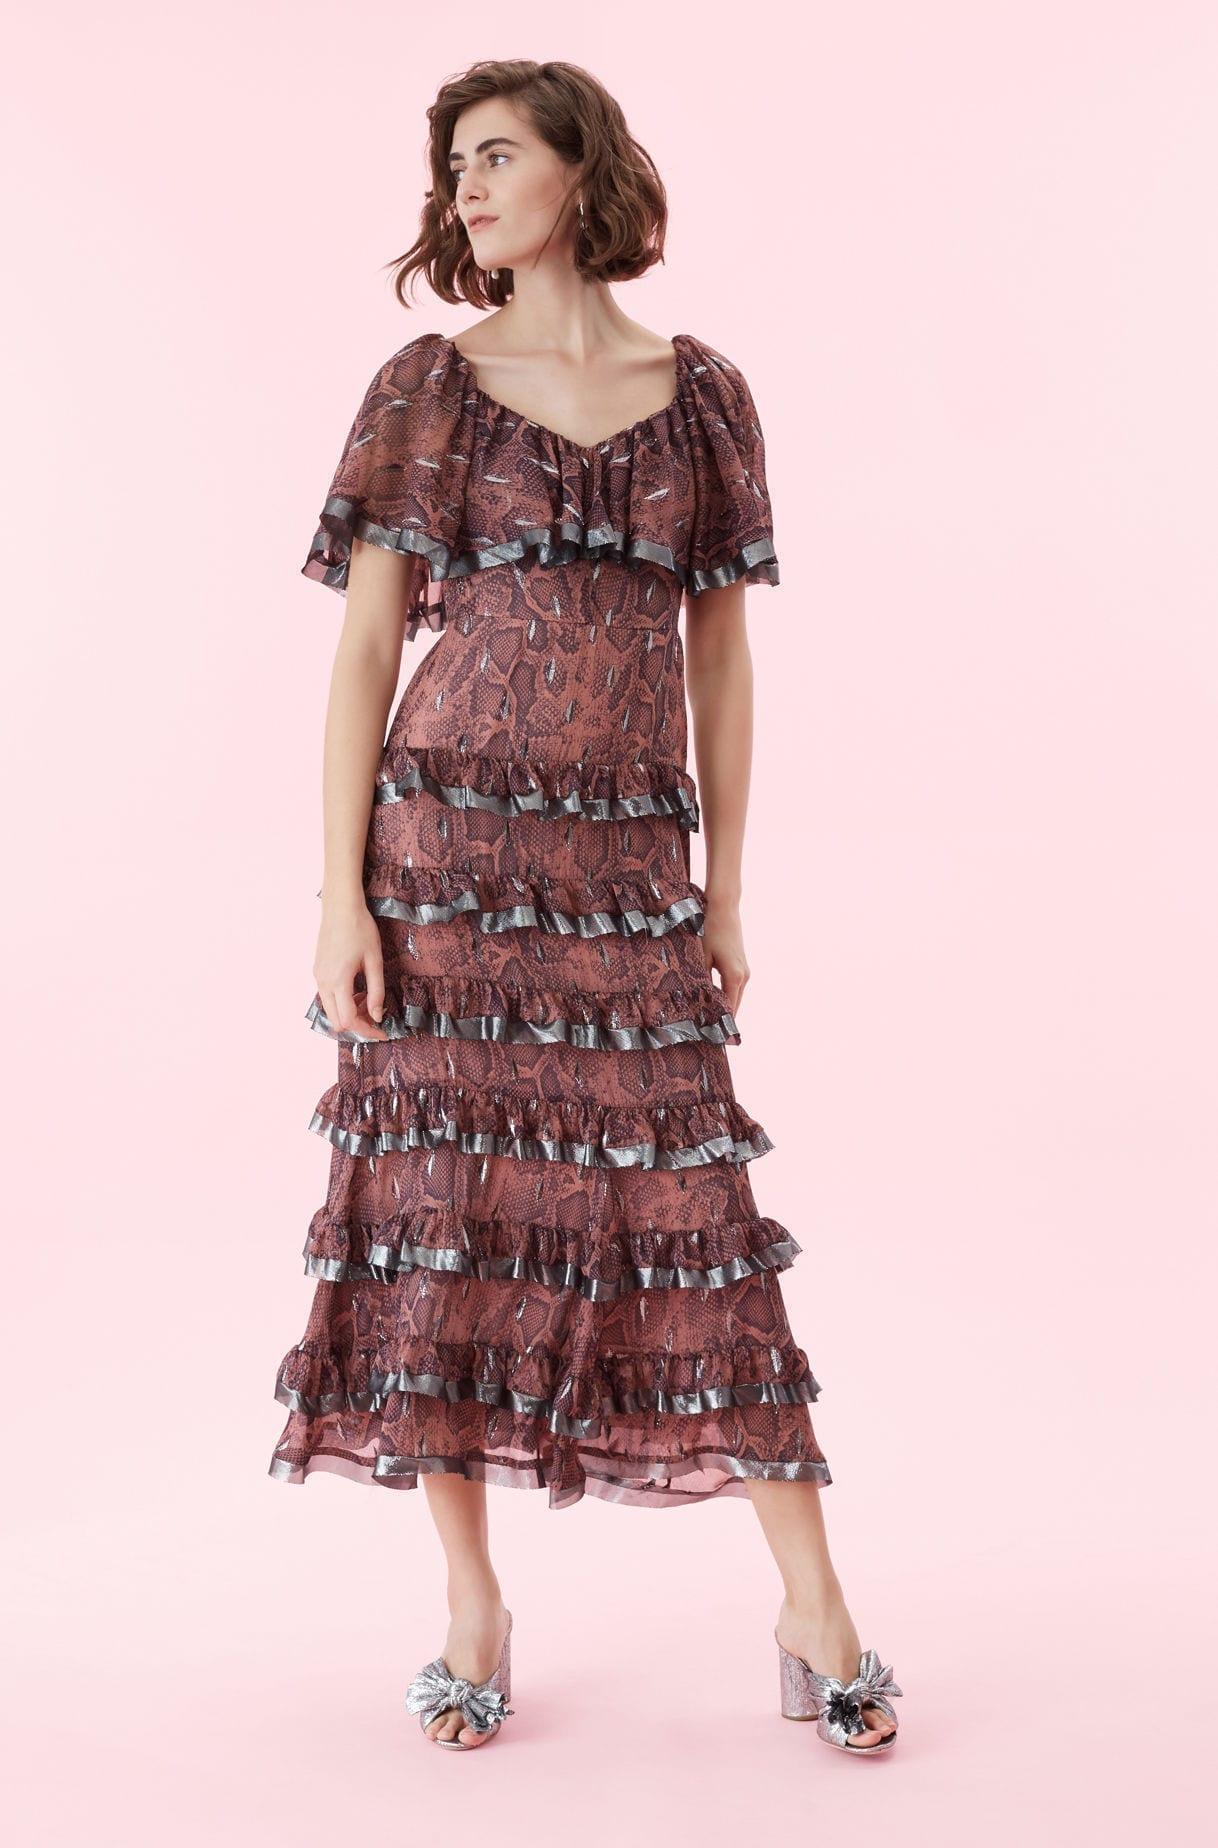 94b121e0c57f REBECCA TAYLOR Snake Print Tiered Ruffle Jam Dress - We Select Dresses